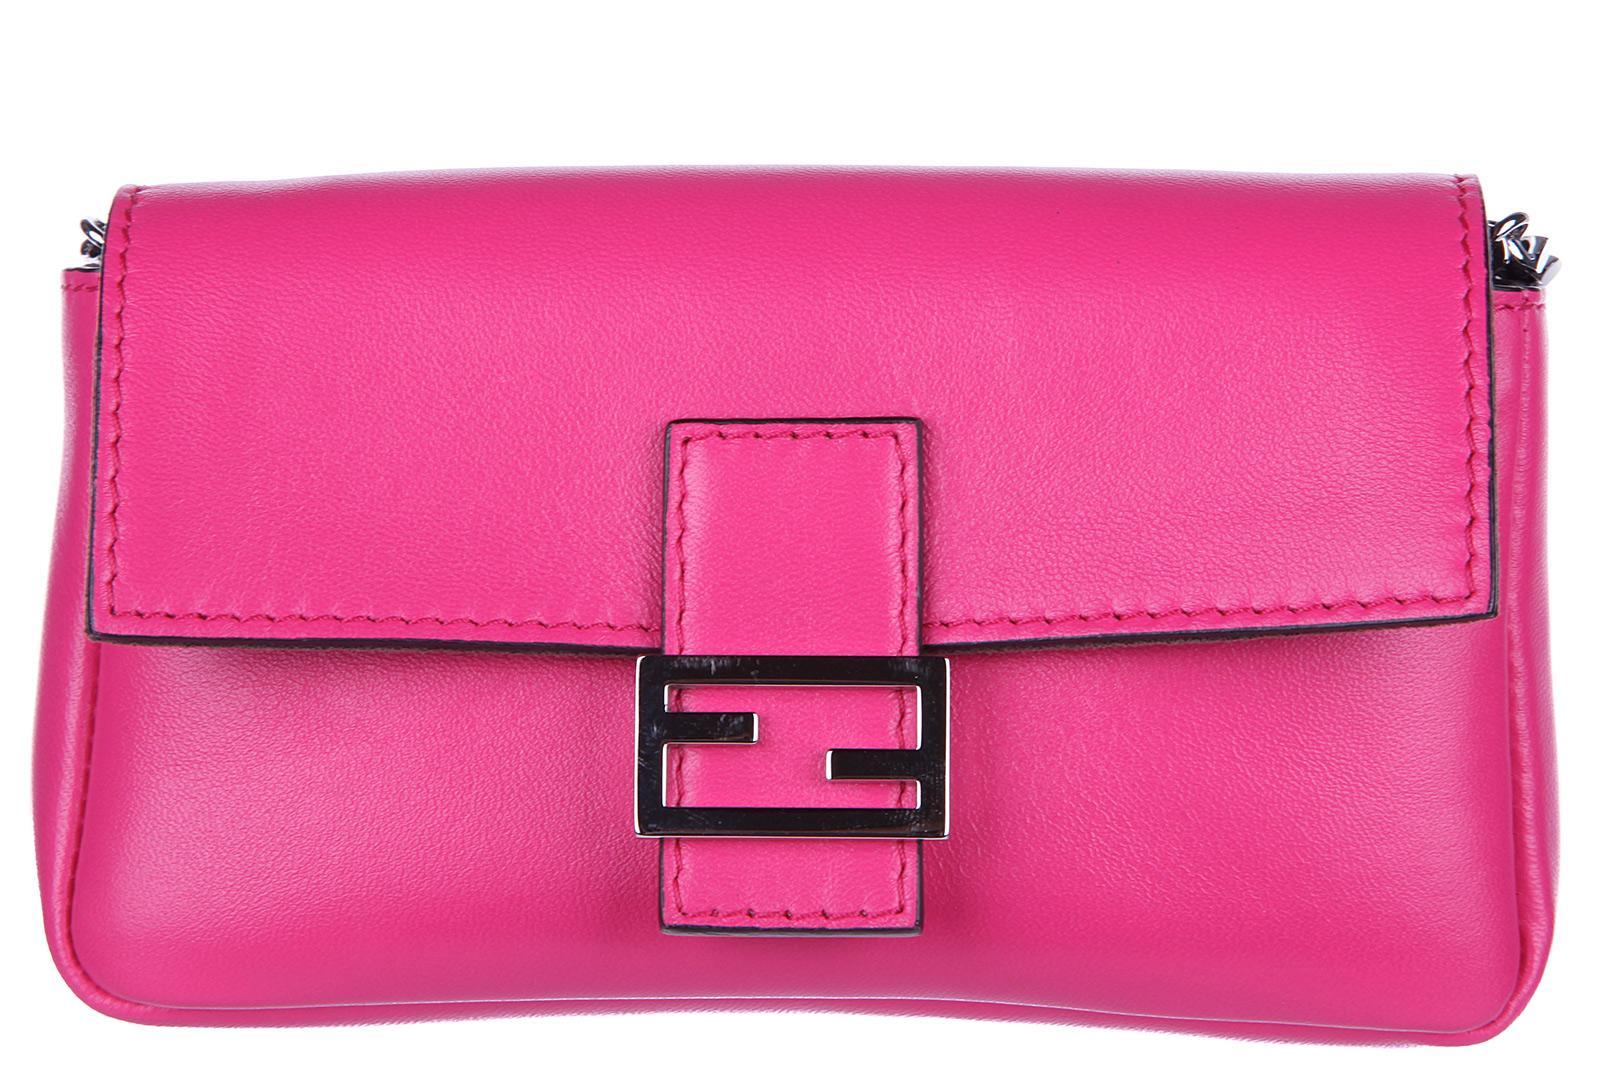 ff257da9d06e Fendi Women S Clutch With Shoulder Strap Handbag Bag Purse Micro Baguette  In Pink